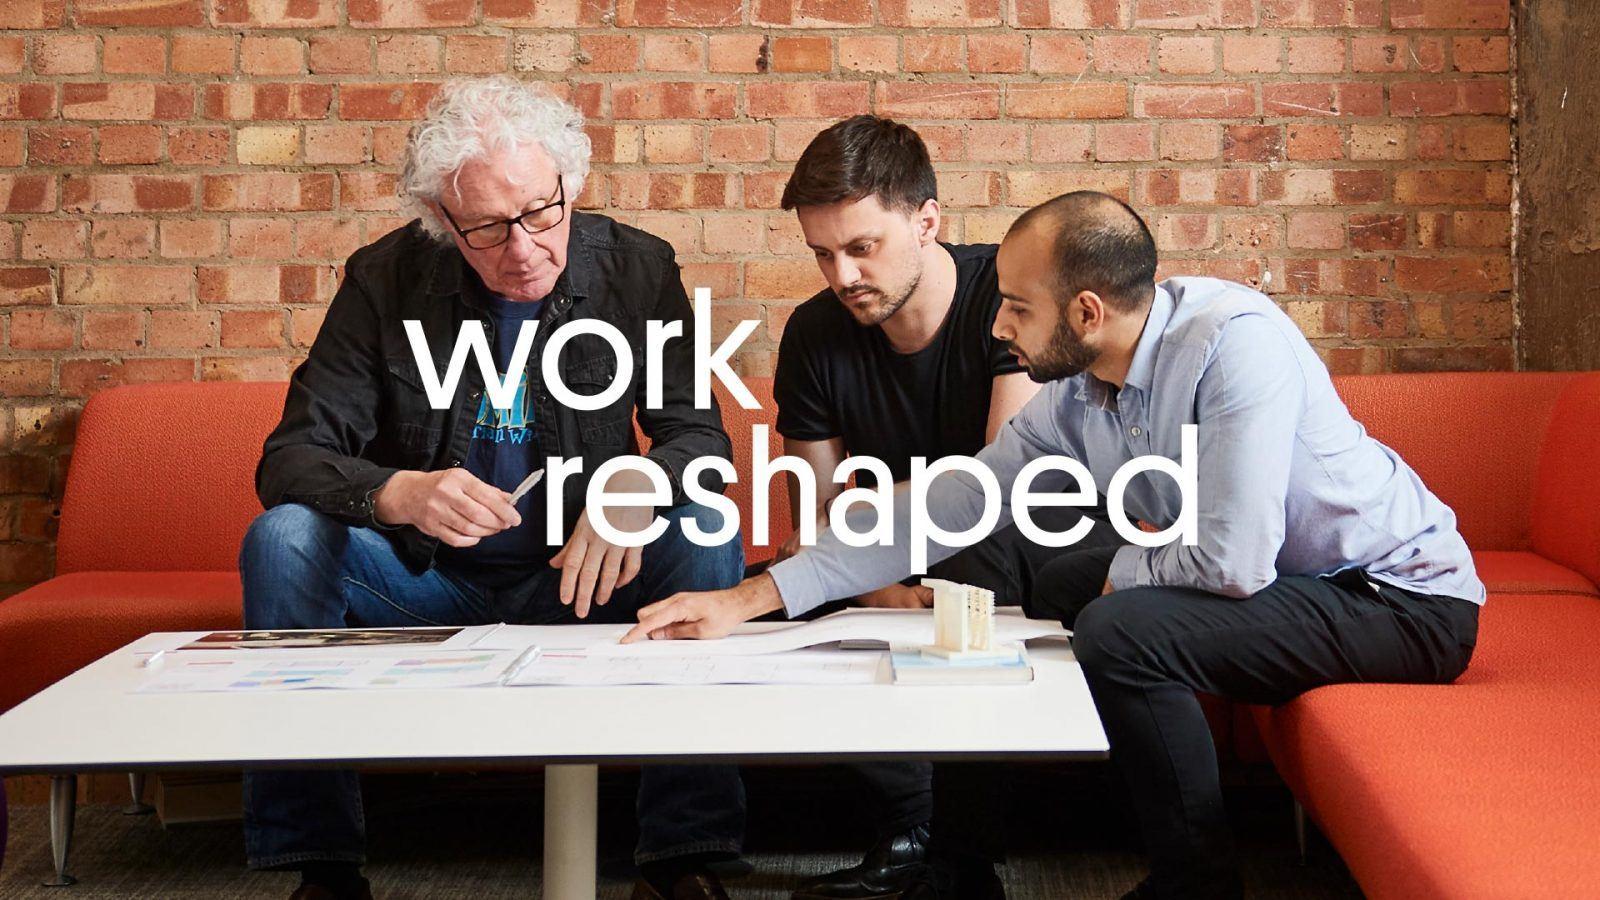 TTSP employees in office - work reshaped